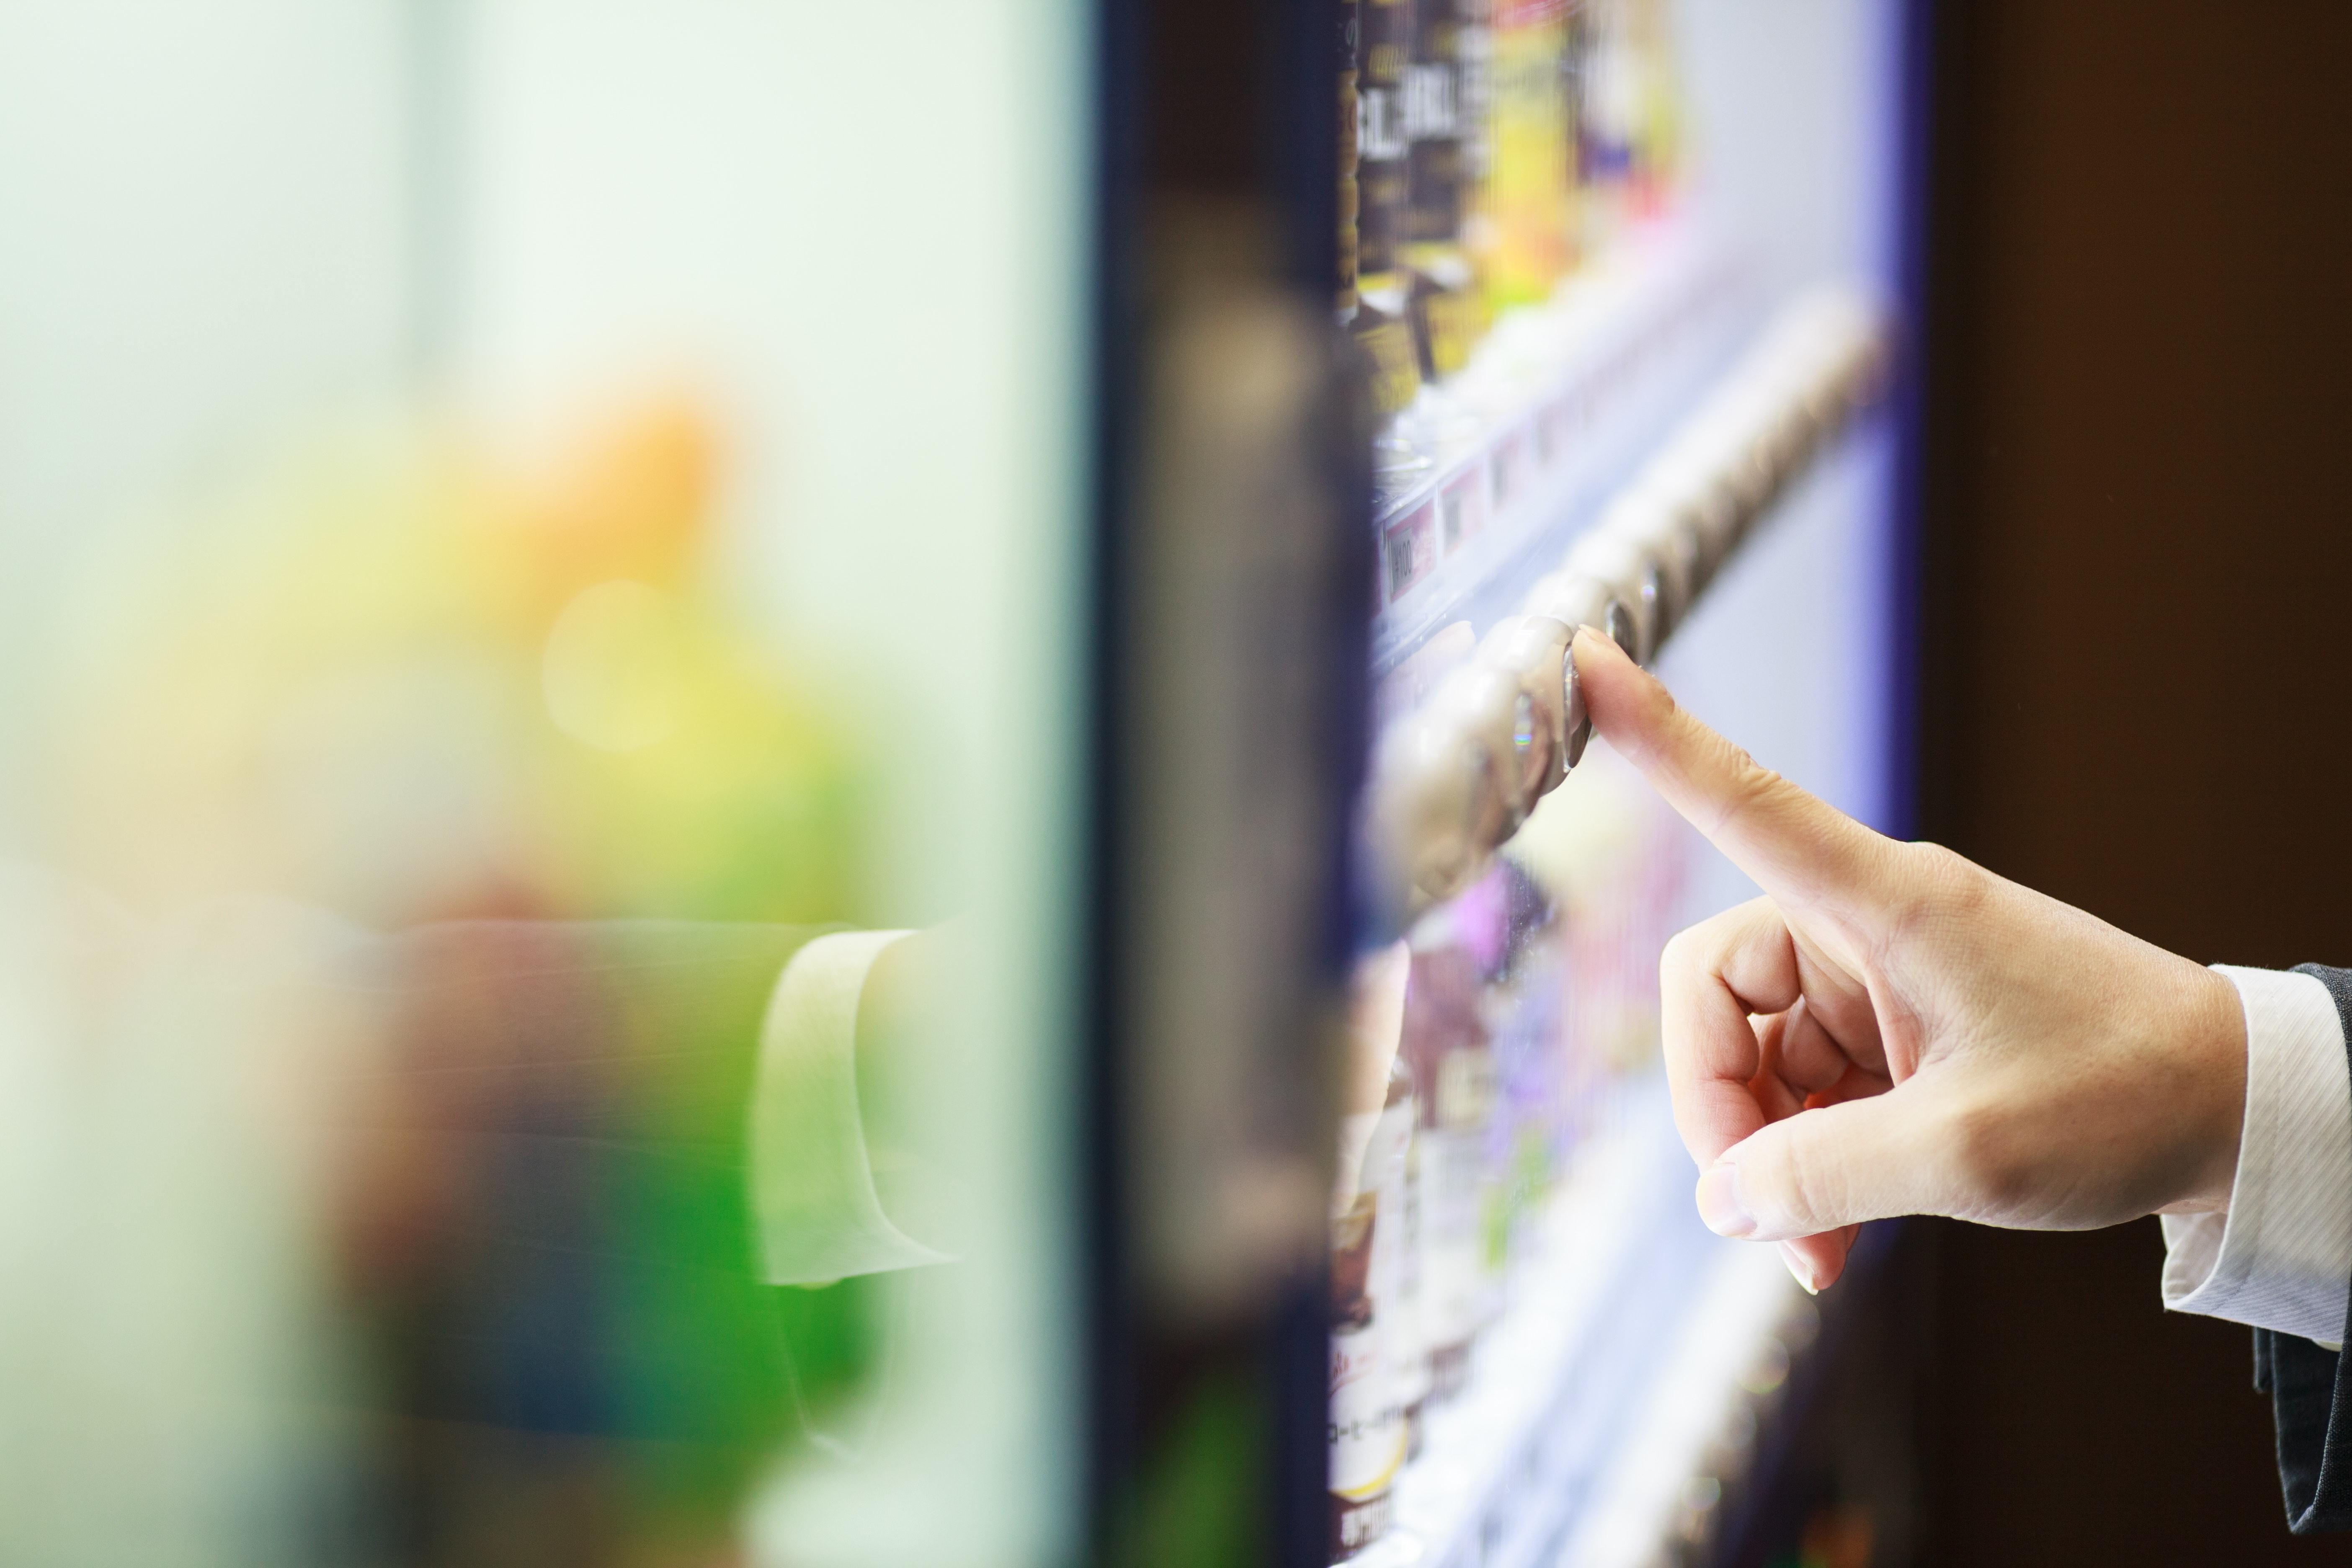 Fuji Hybrid vending machines launched across Monash University campuses